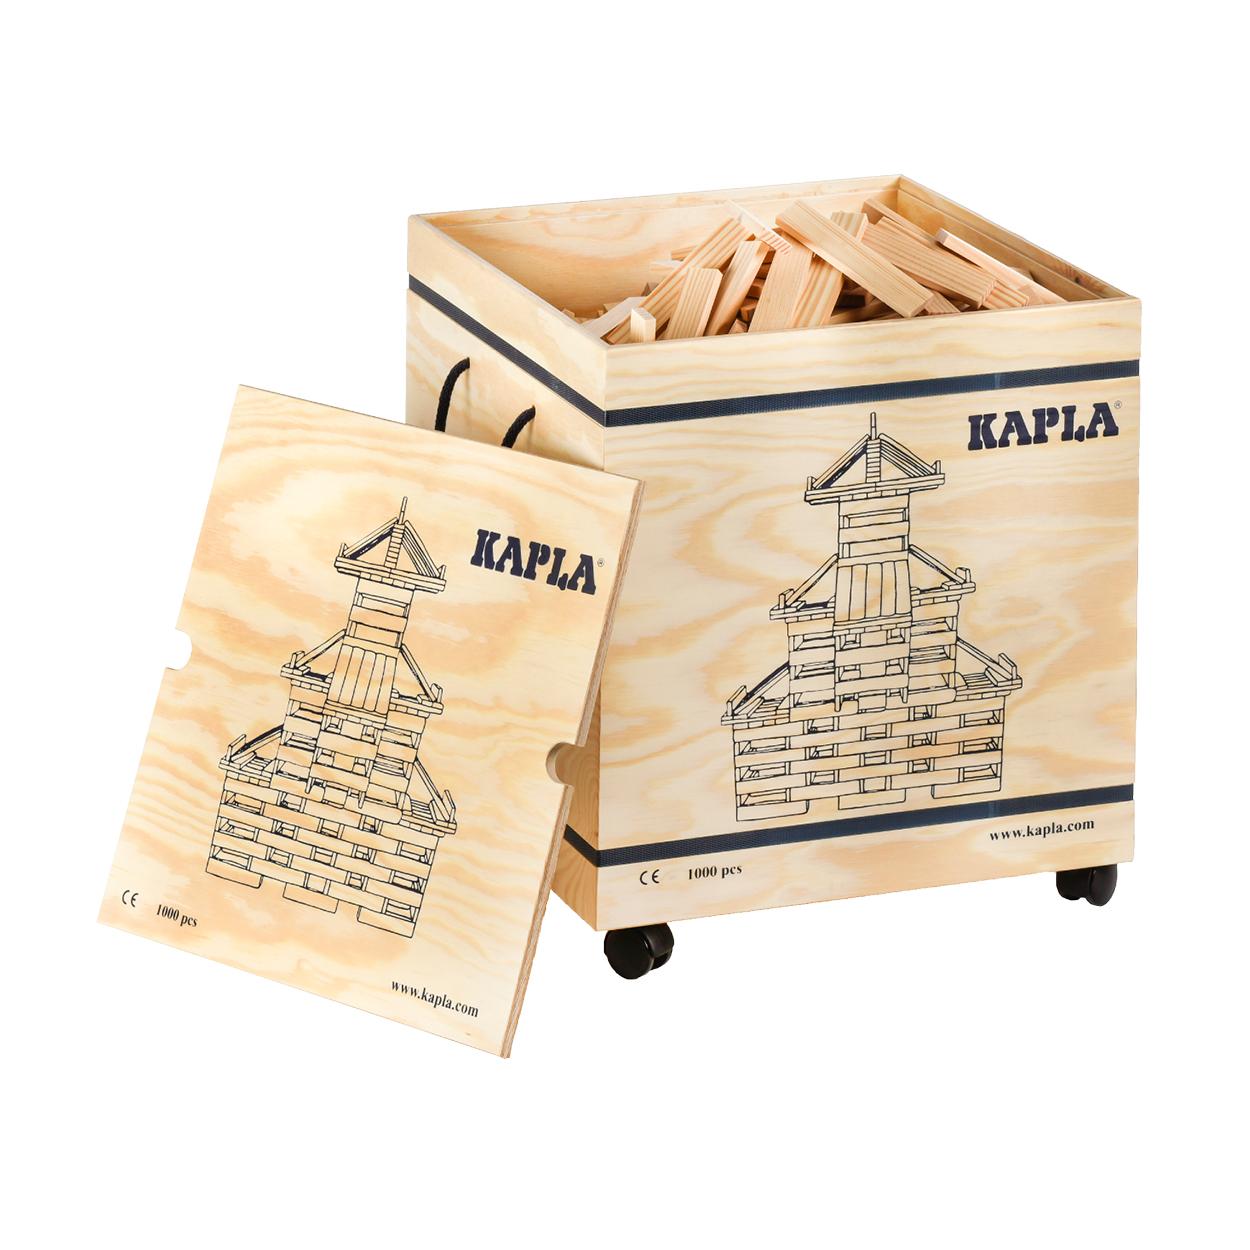 FAP-K-1000-KAPLA1000 積木盒 (1000PCS)